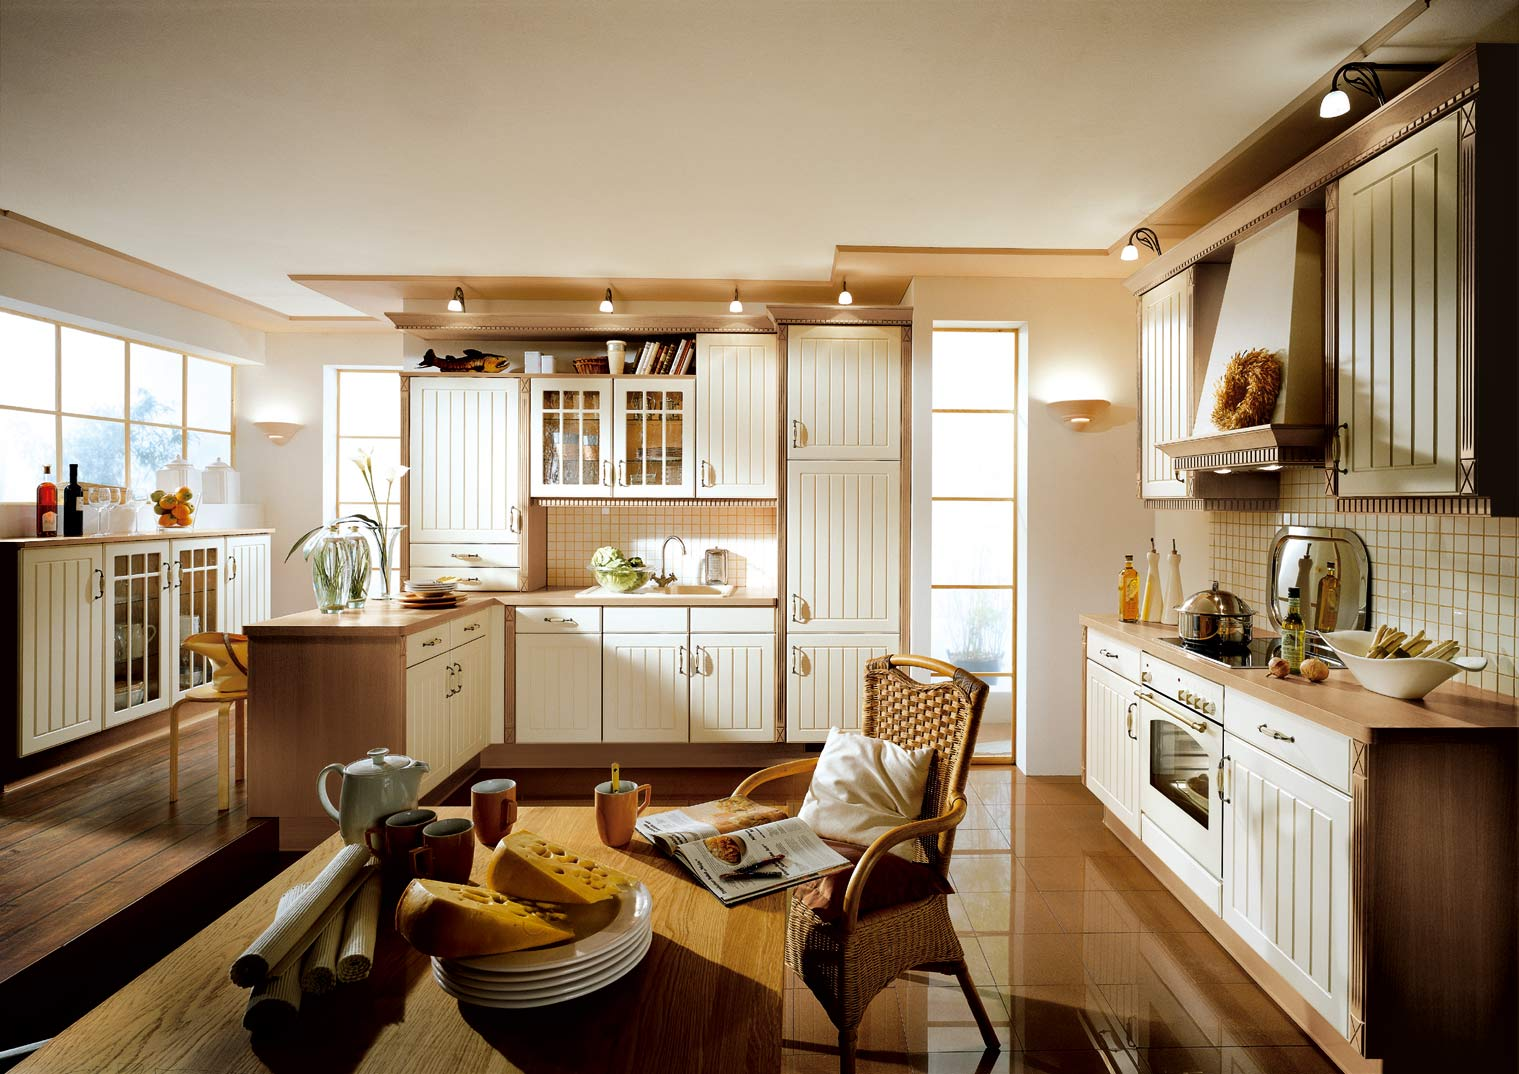 Кухня цвета ванили во французском стиле